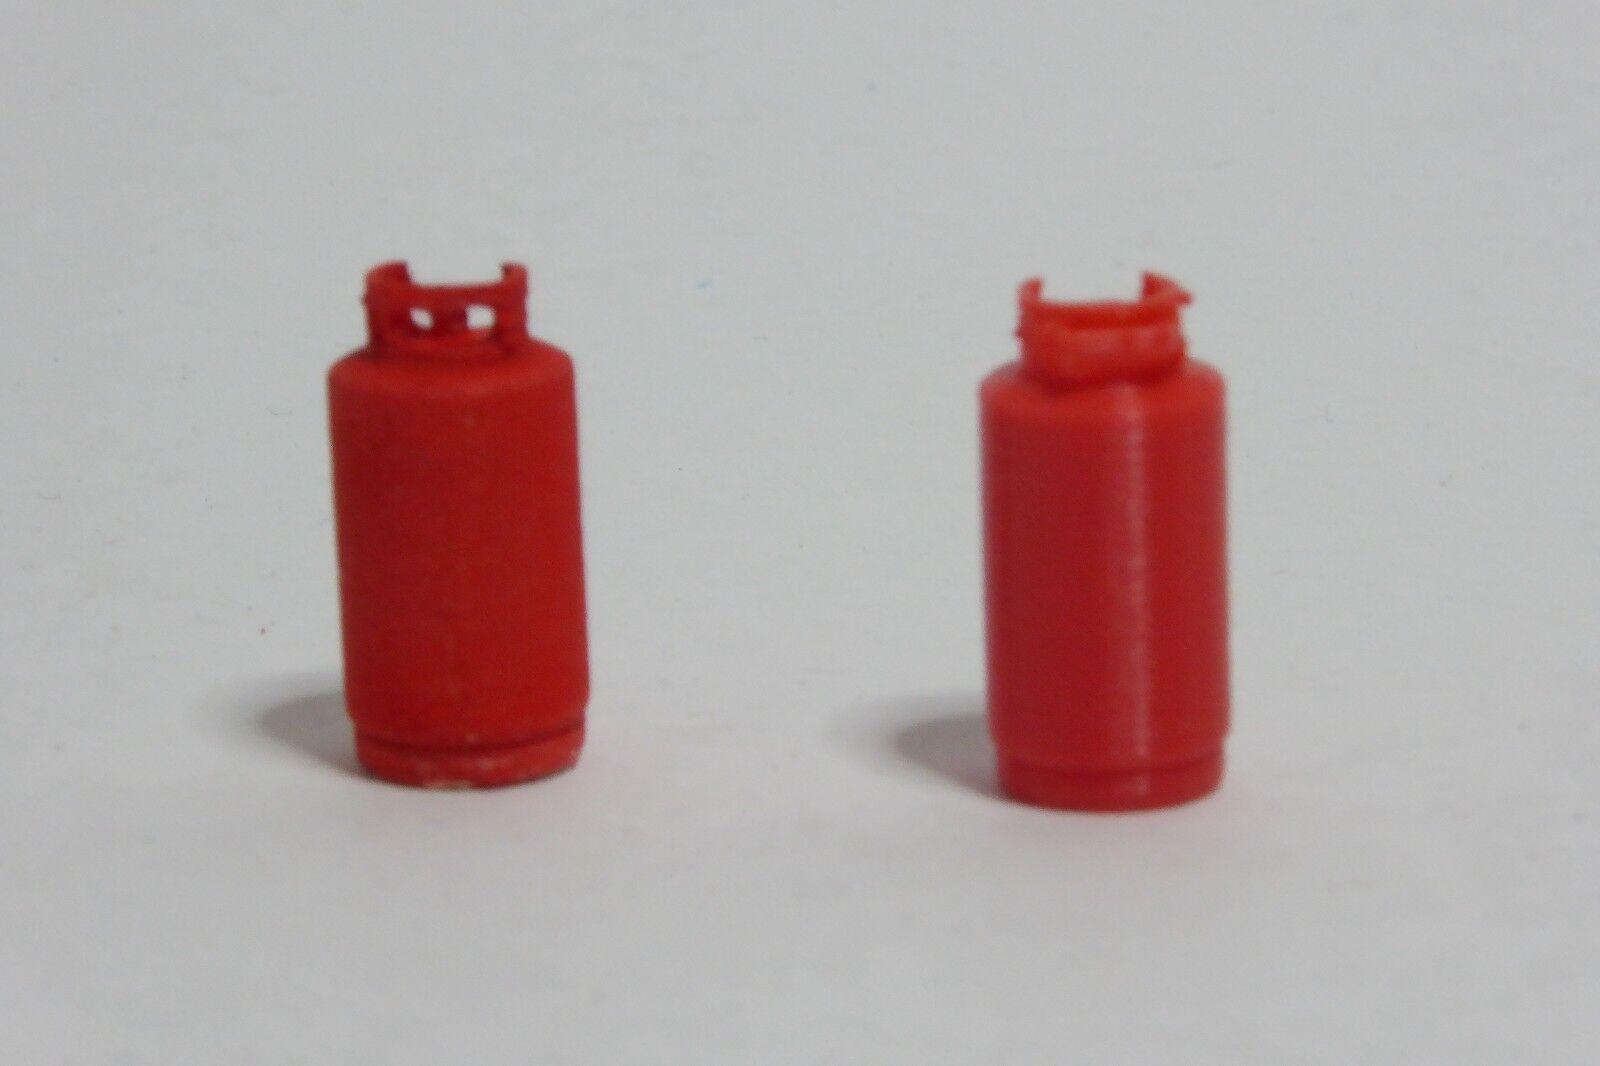 10X gas cylinders 1 1 1 gauge 10L, 24L, 35L, 47L, 108L and 118L 3d printed df6006